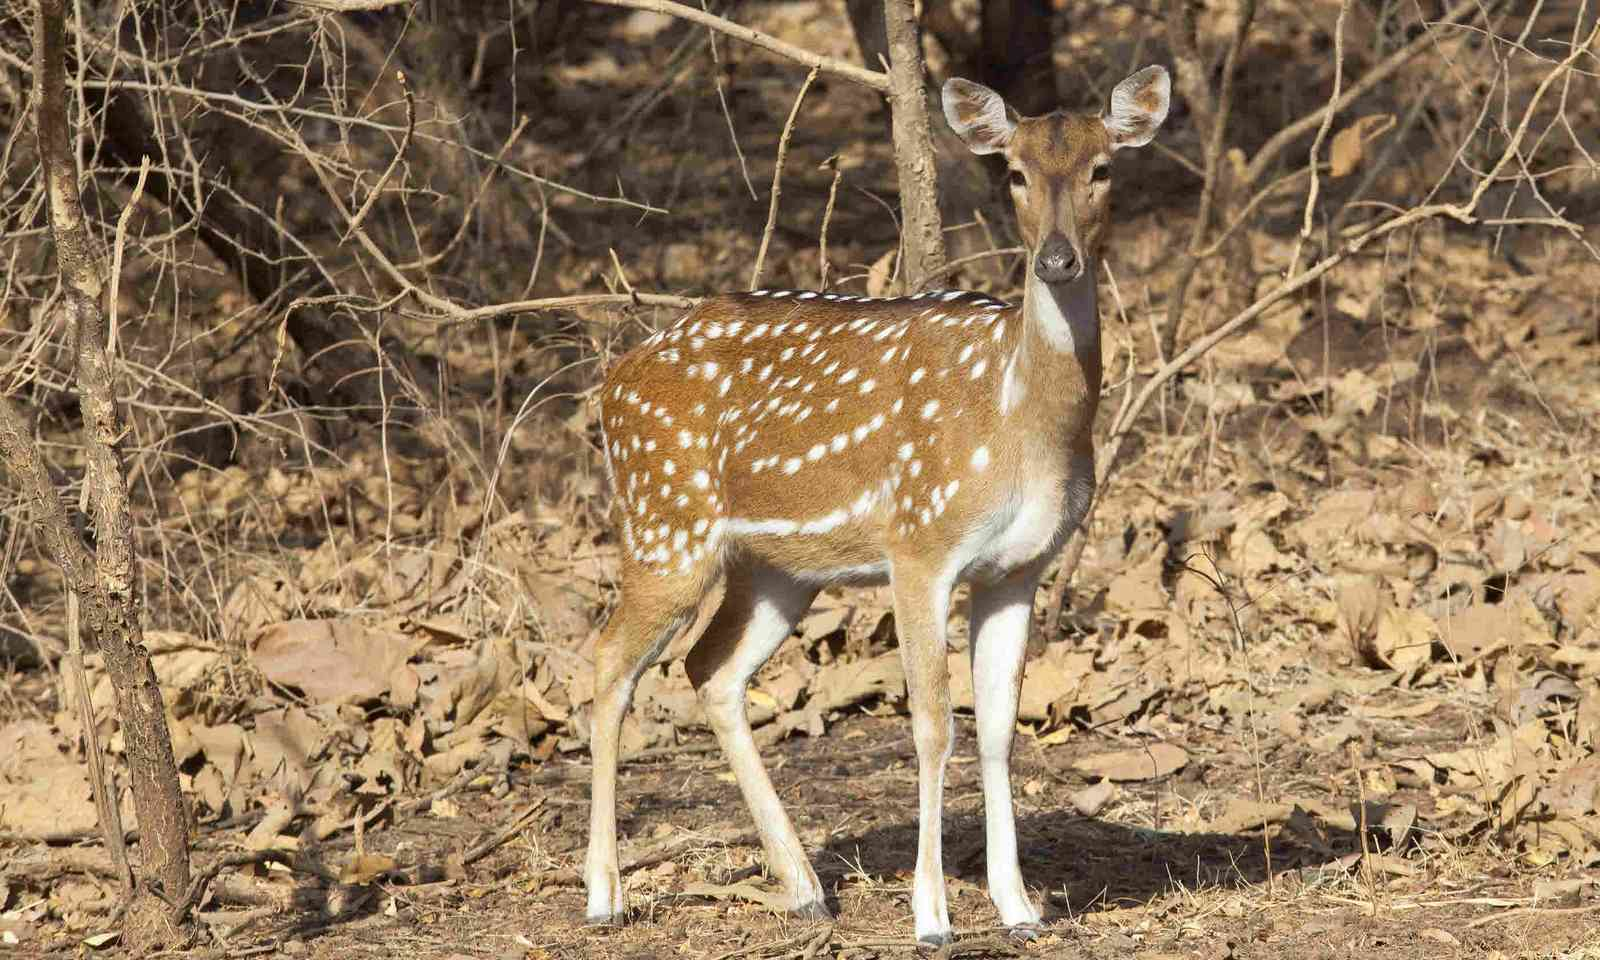 Female spotted deer in Gujarat, India (Shutterstock)